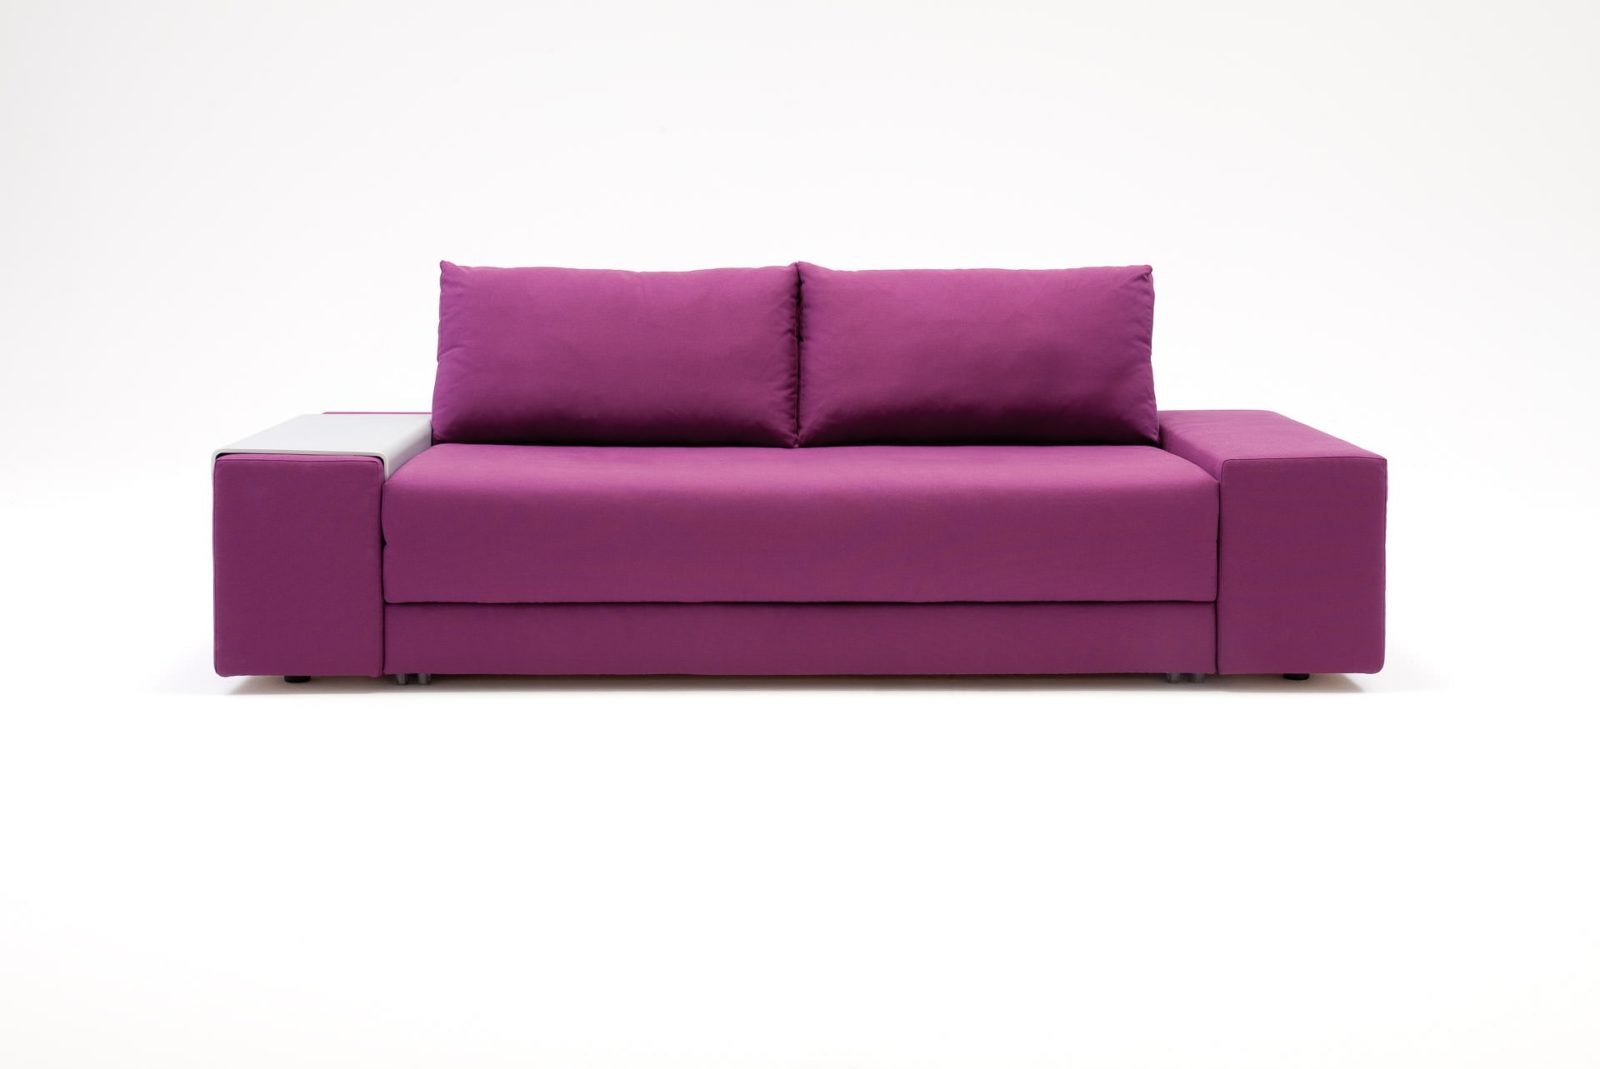 confetto schlafsofas lounge gruppen relaxsessel und objektaustattung. Black Bedroom Furniture Sets. Home Design Ideas